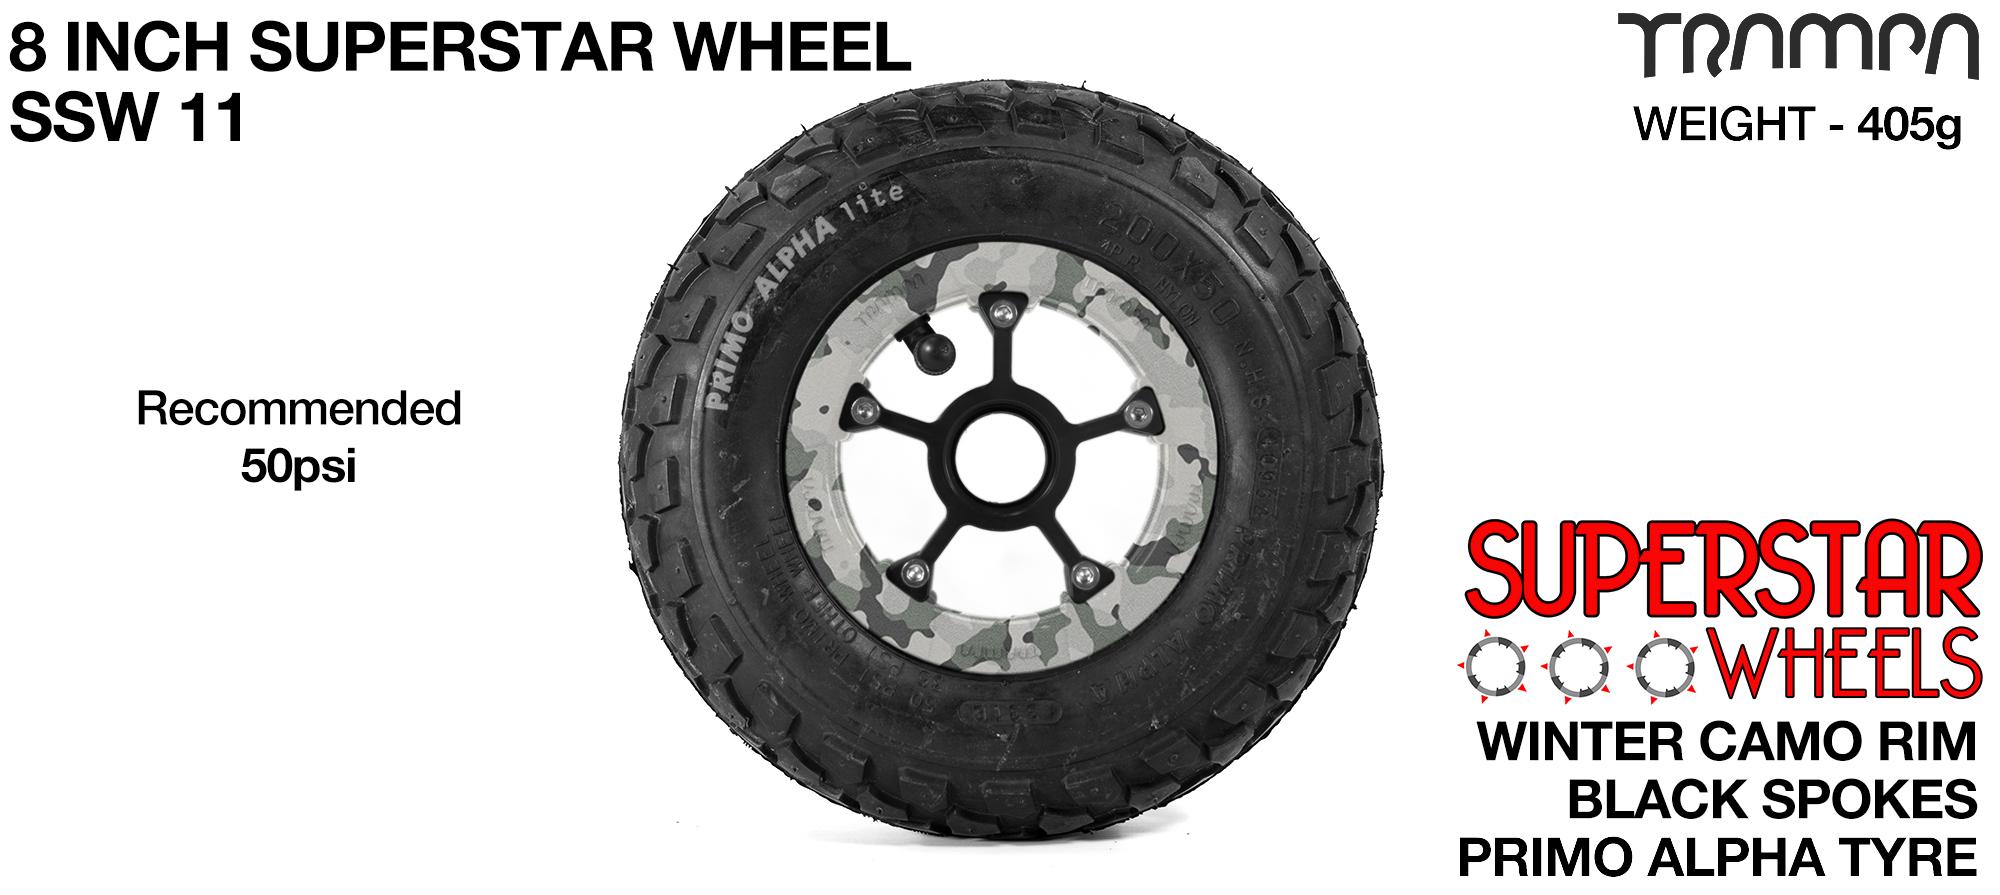 Superstar 8 inch wheel - Winter Camo Rim Black Anodised spokes & Black Alpha 8 Inch Tyres